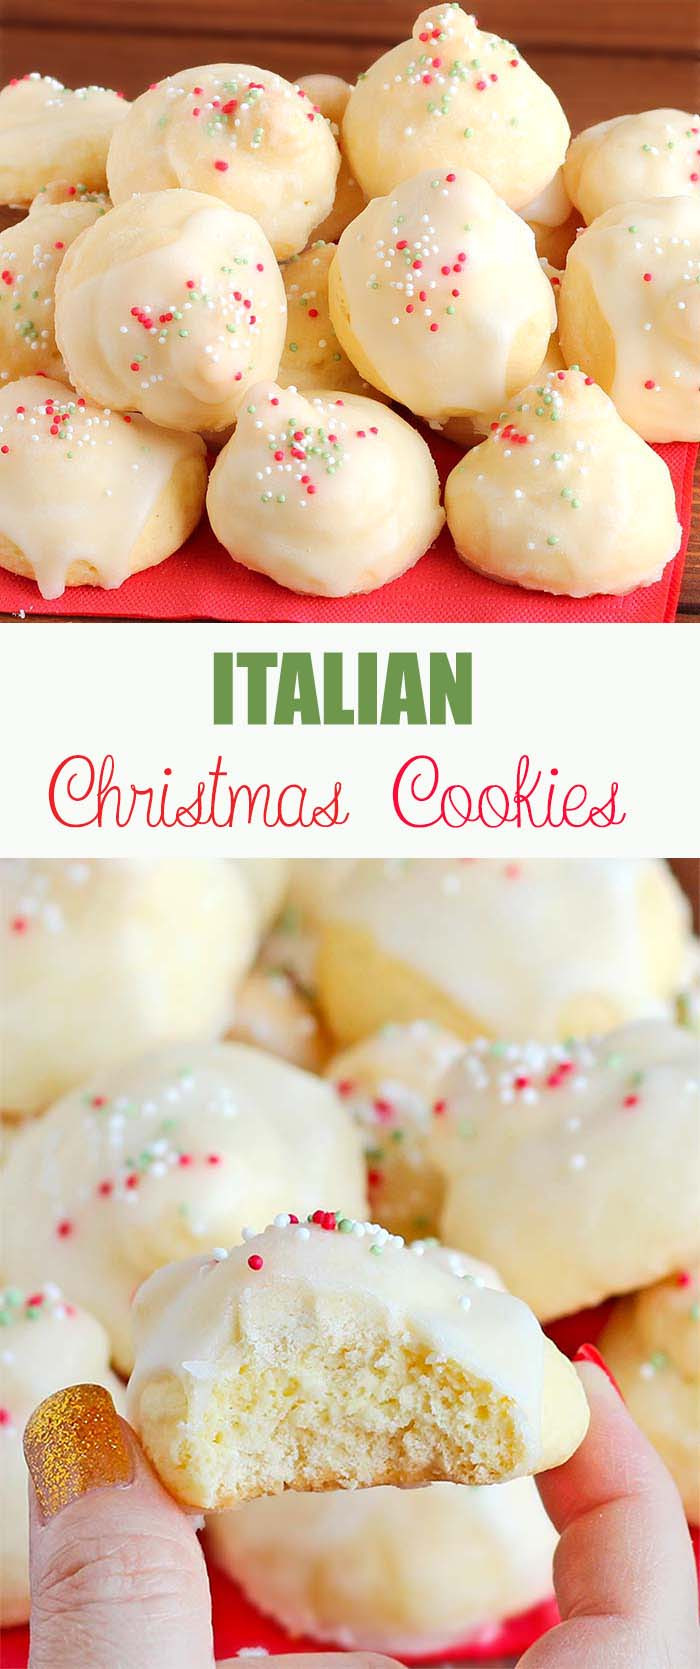 Popular Christmas Cookies Recipes  Italian Christmas Cookies Cakescottage